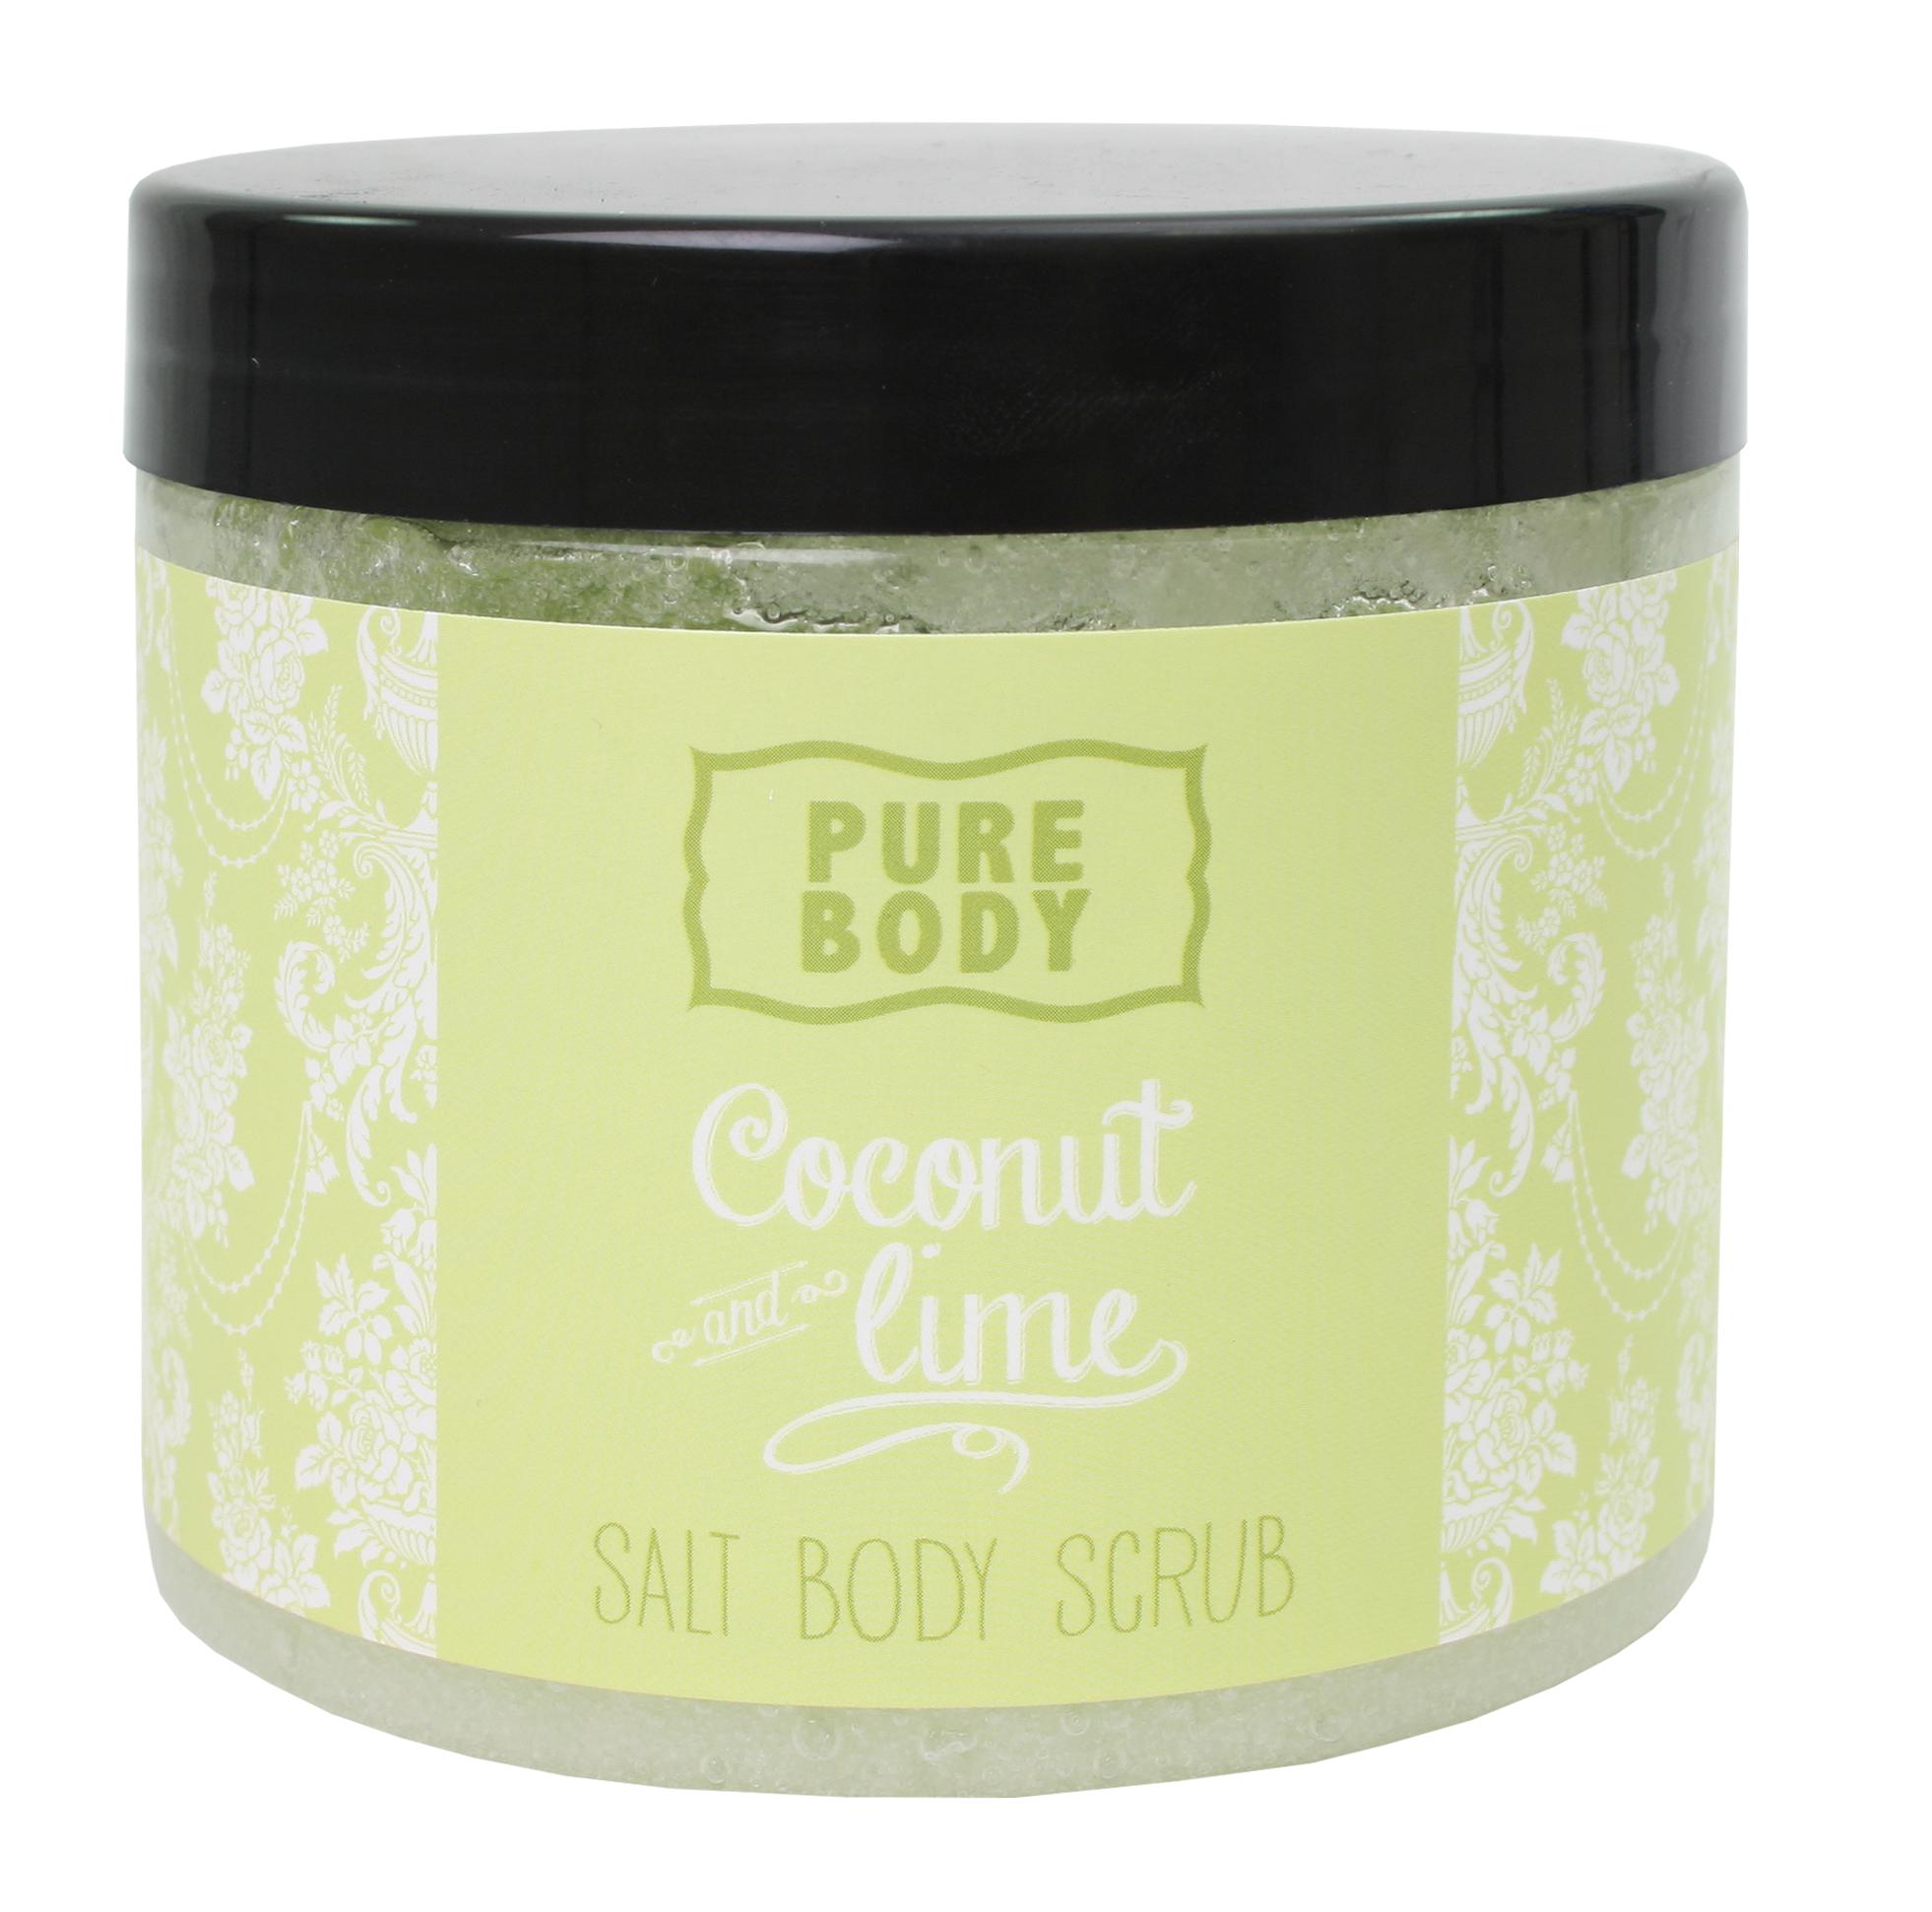 Splosh PURE BODY - Body Scrub - Coconut and Lime - RRP $19.95